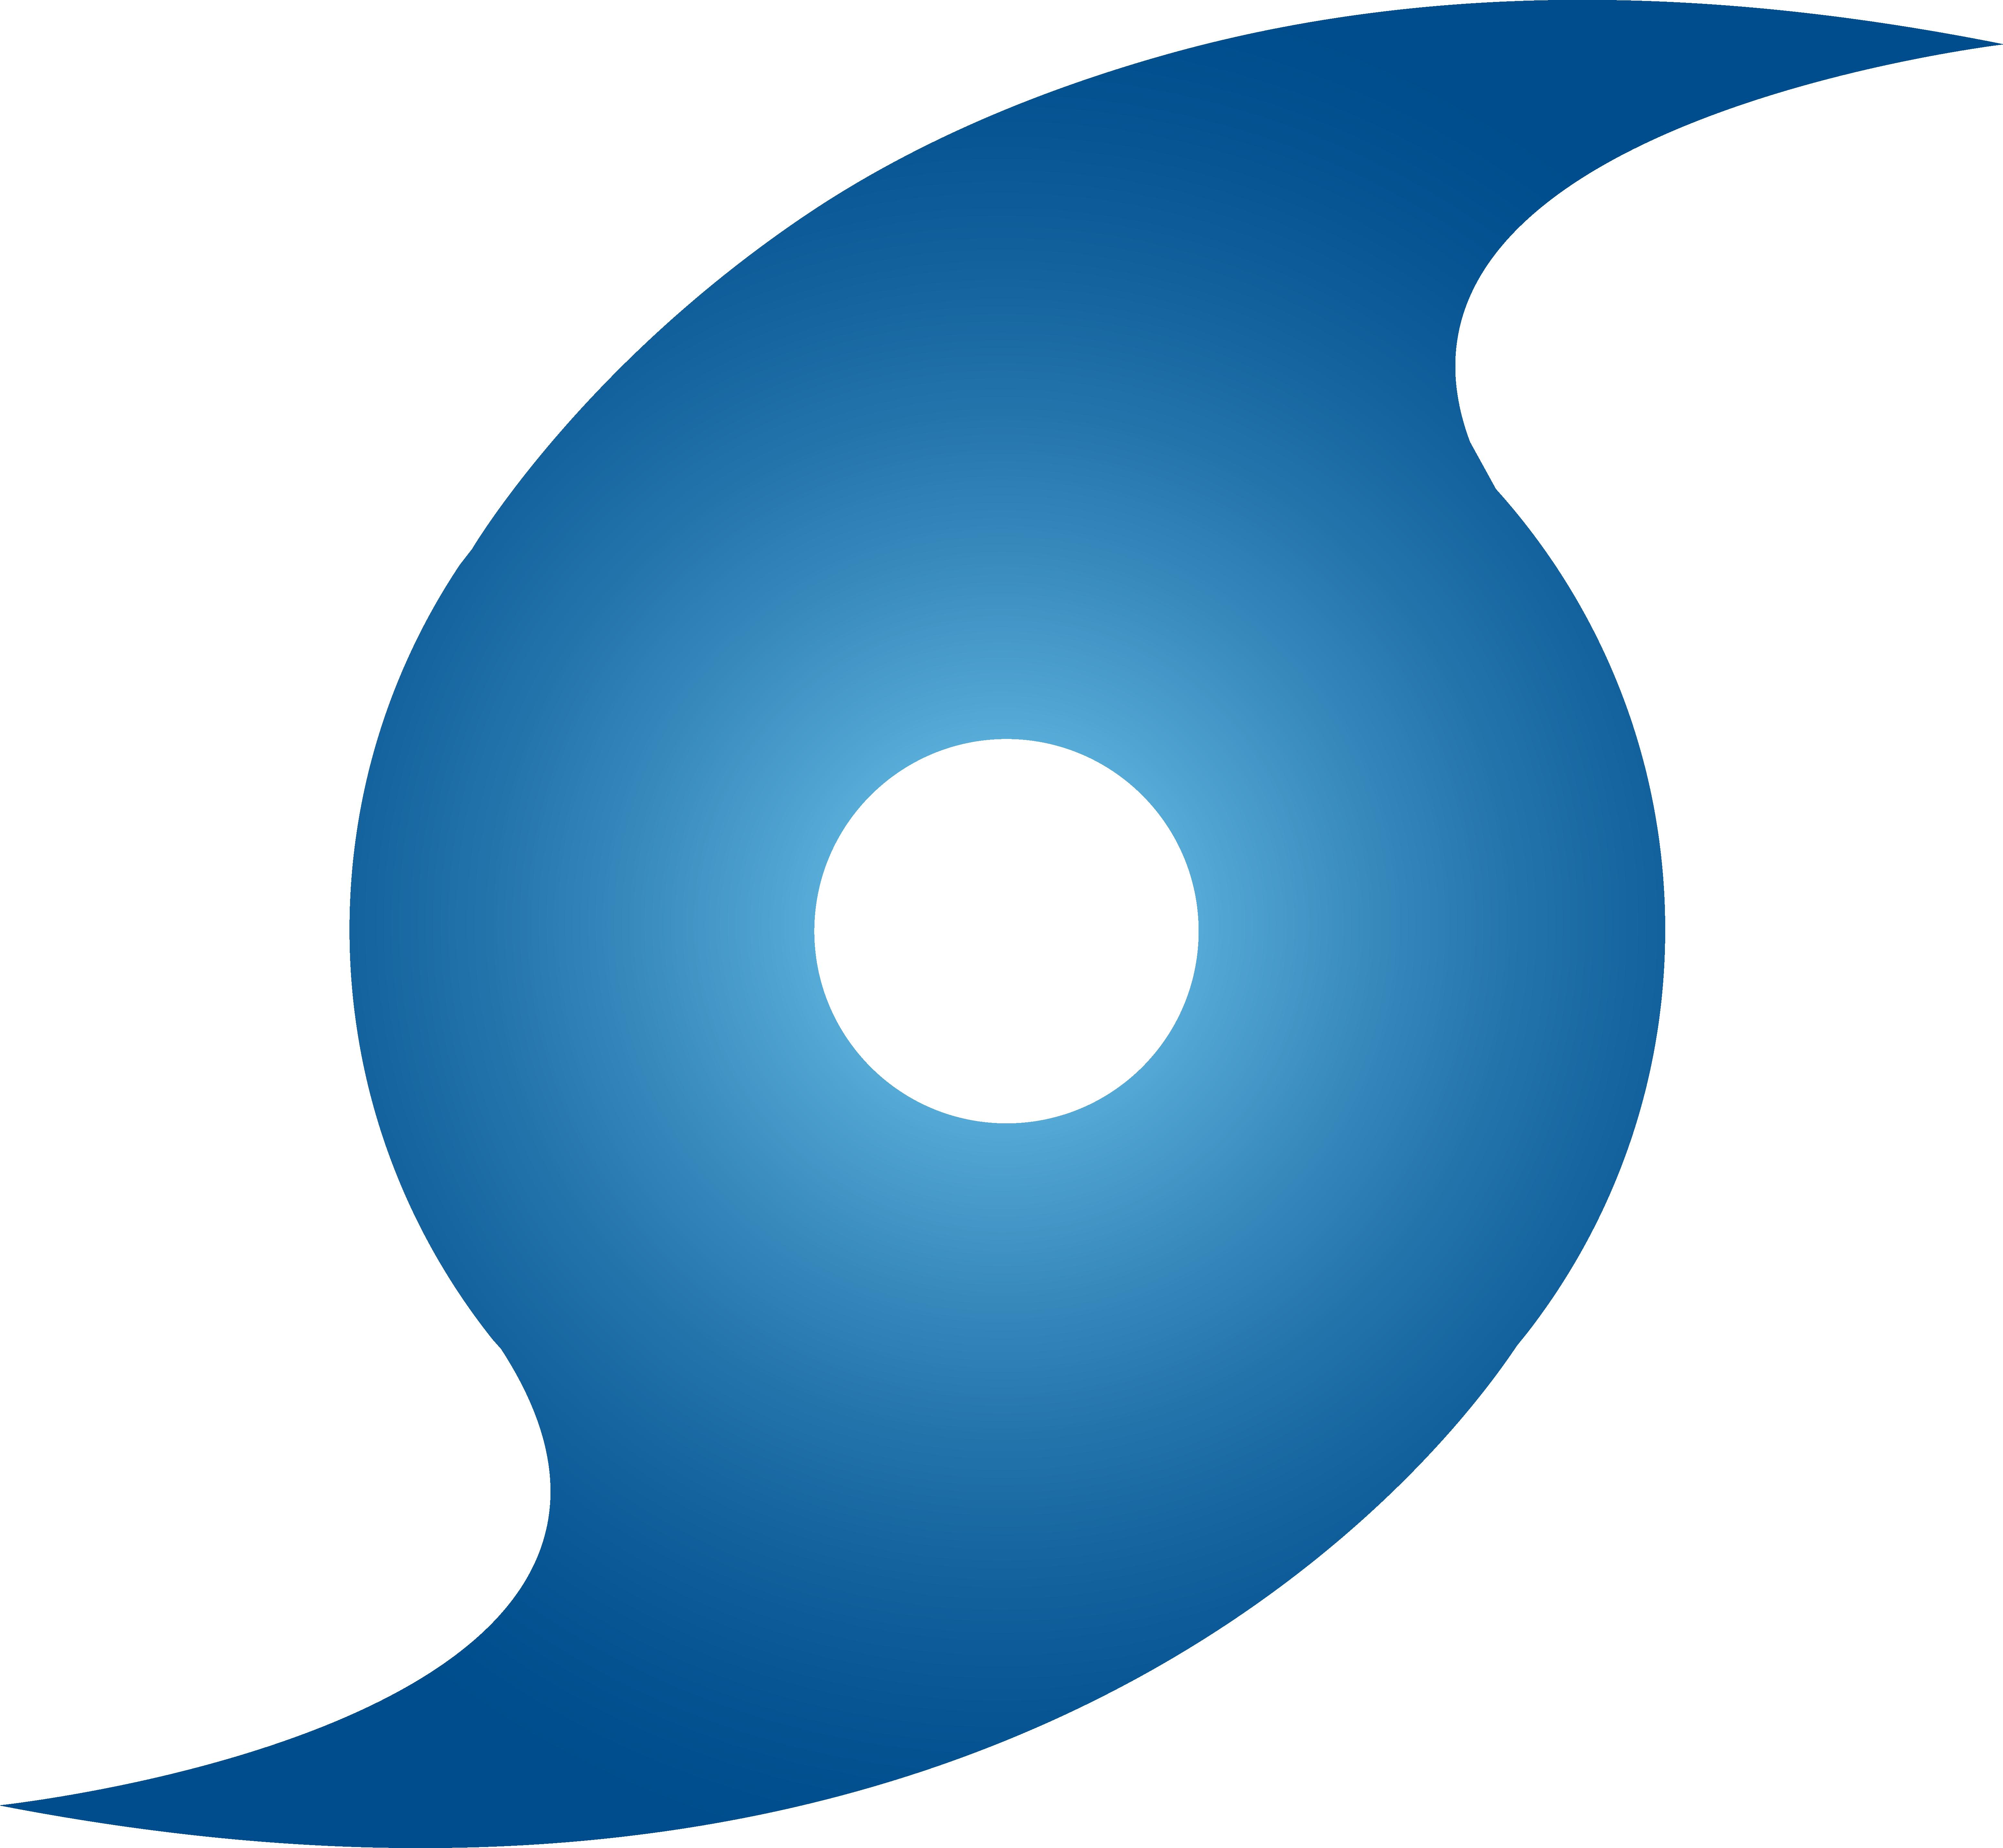 Free Hurricane Transparent, Download Free Clip Art, Free.